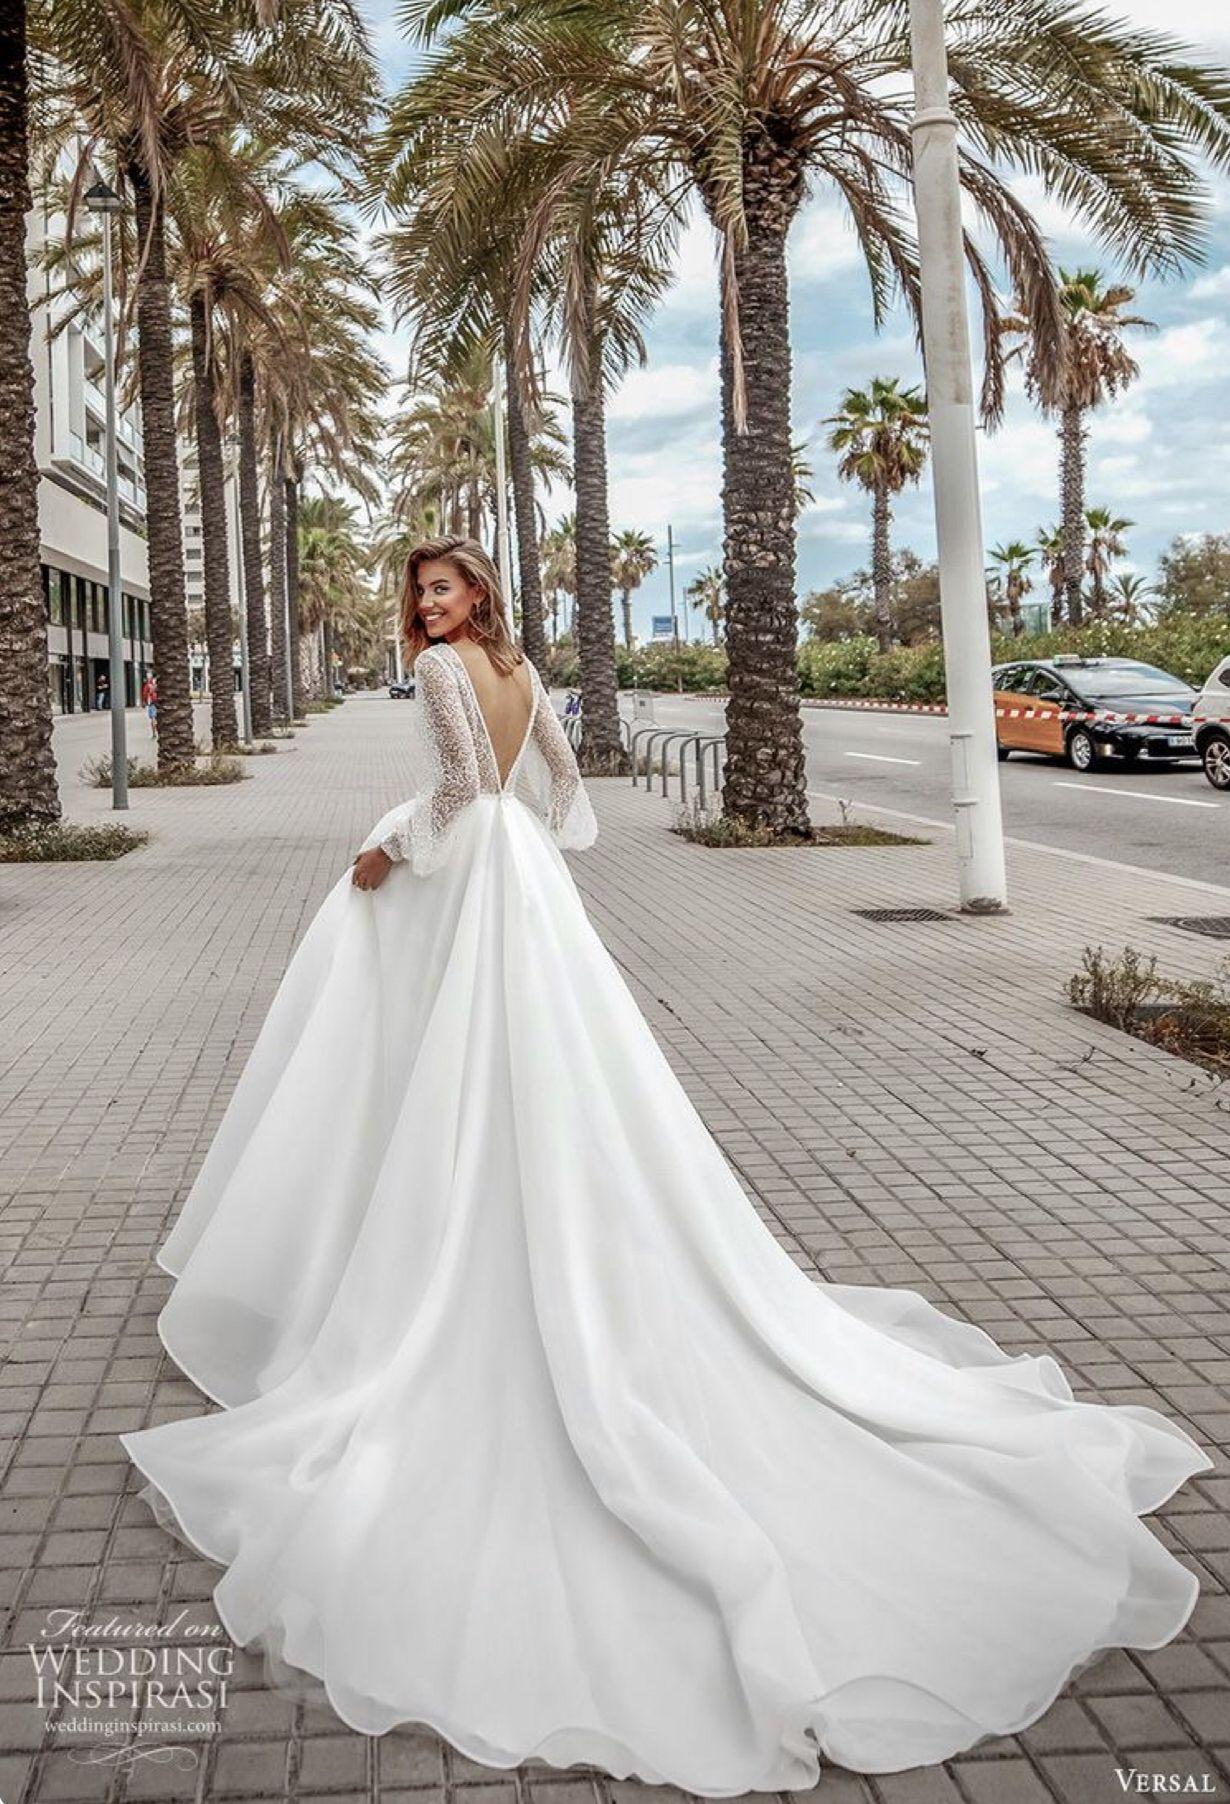 The Smile You Have When Wearing Your Dream Dress In 2020 Civil Wedding Dresses Bridal Dresses Bridal Dresses Vintage